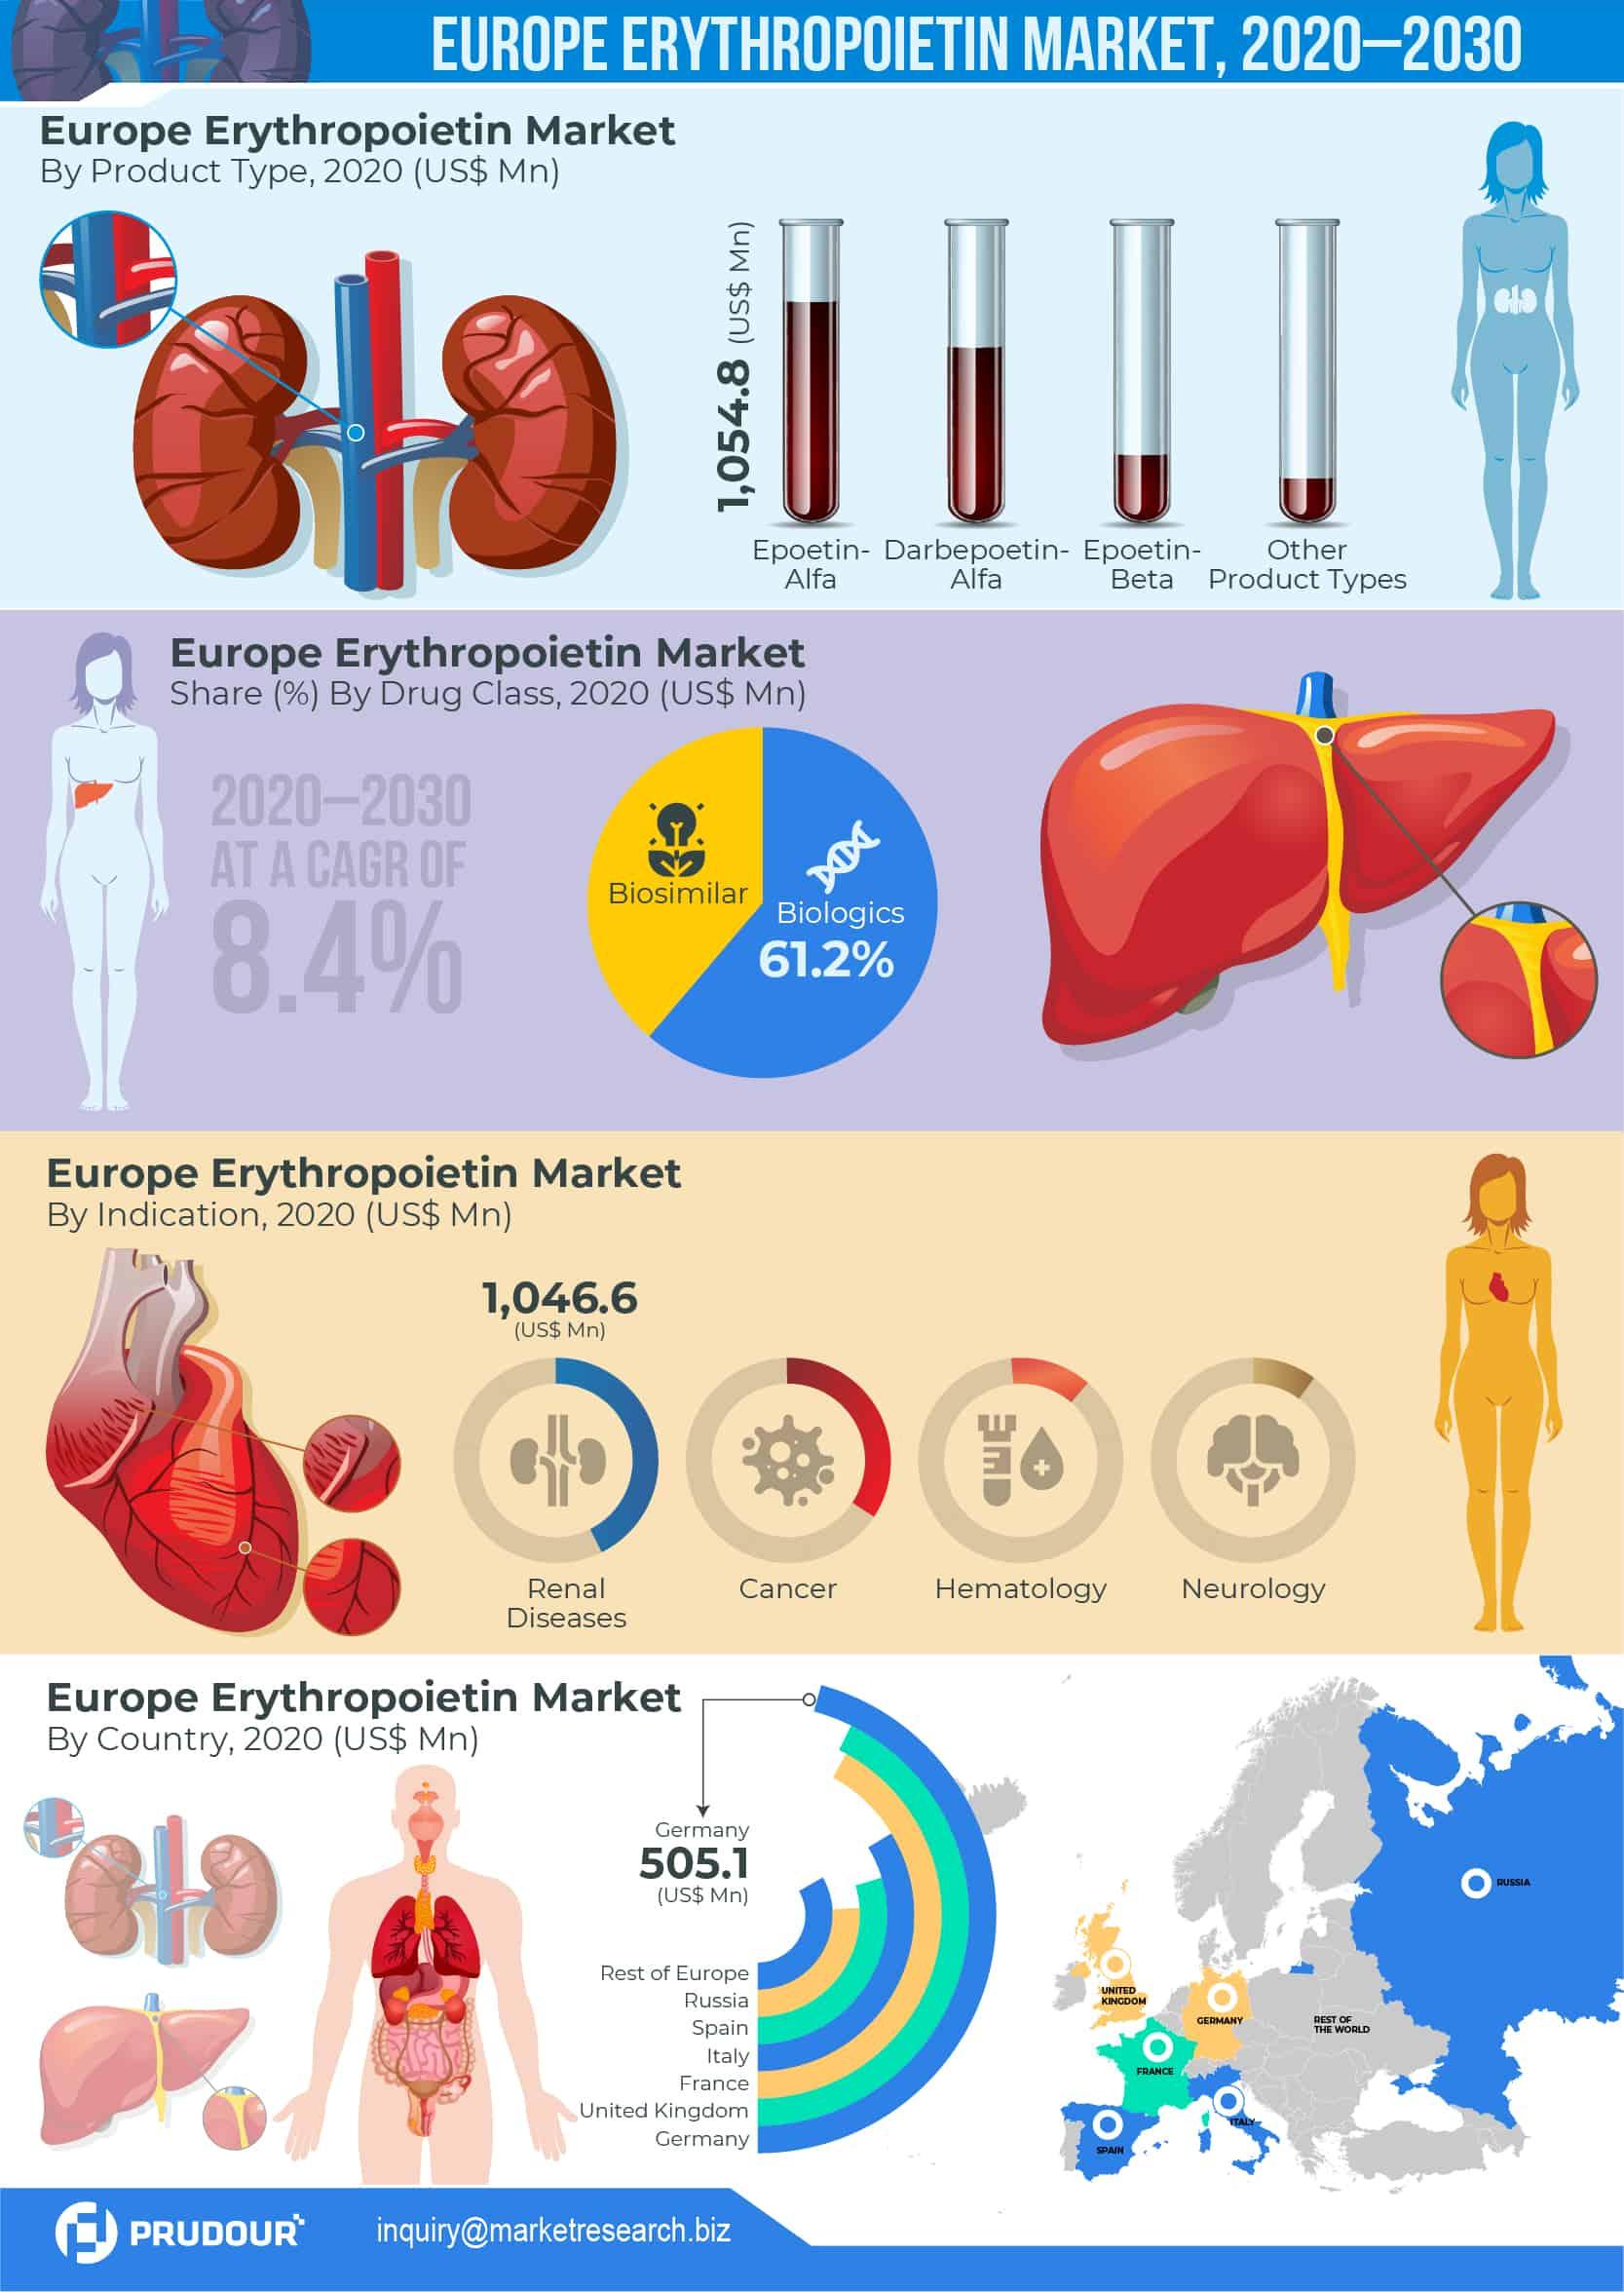 Europe Erythropoietin Market